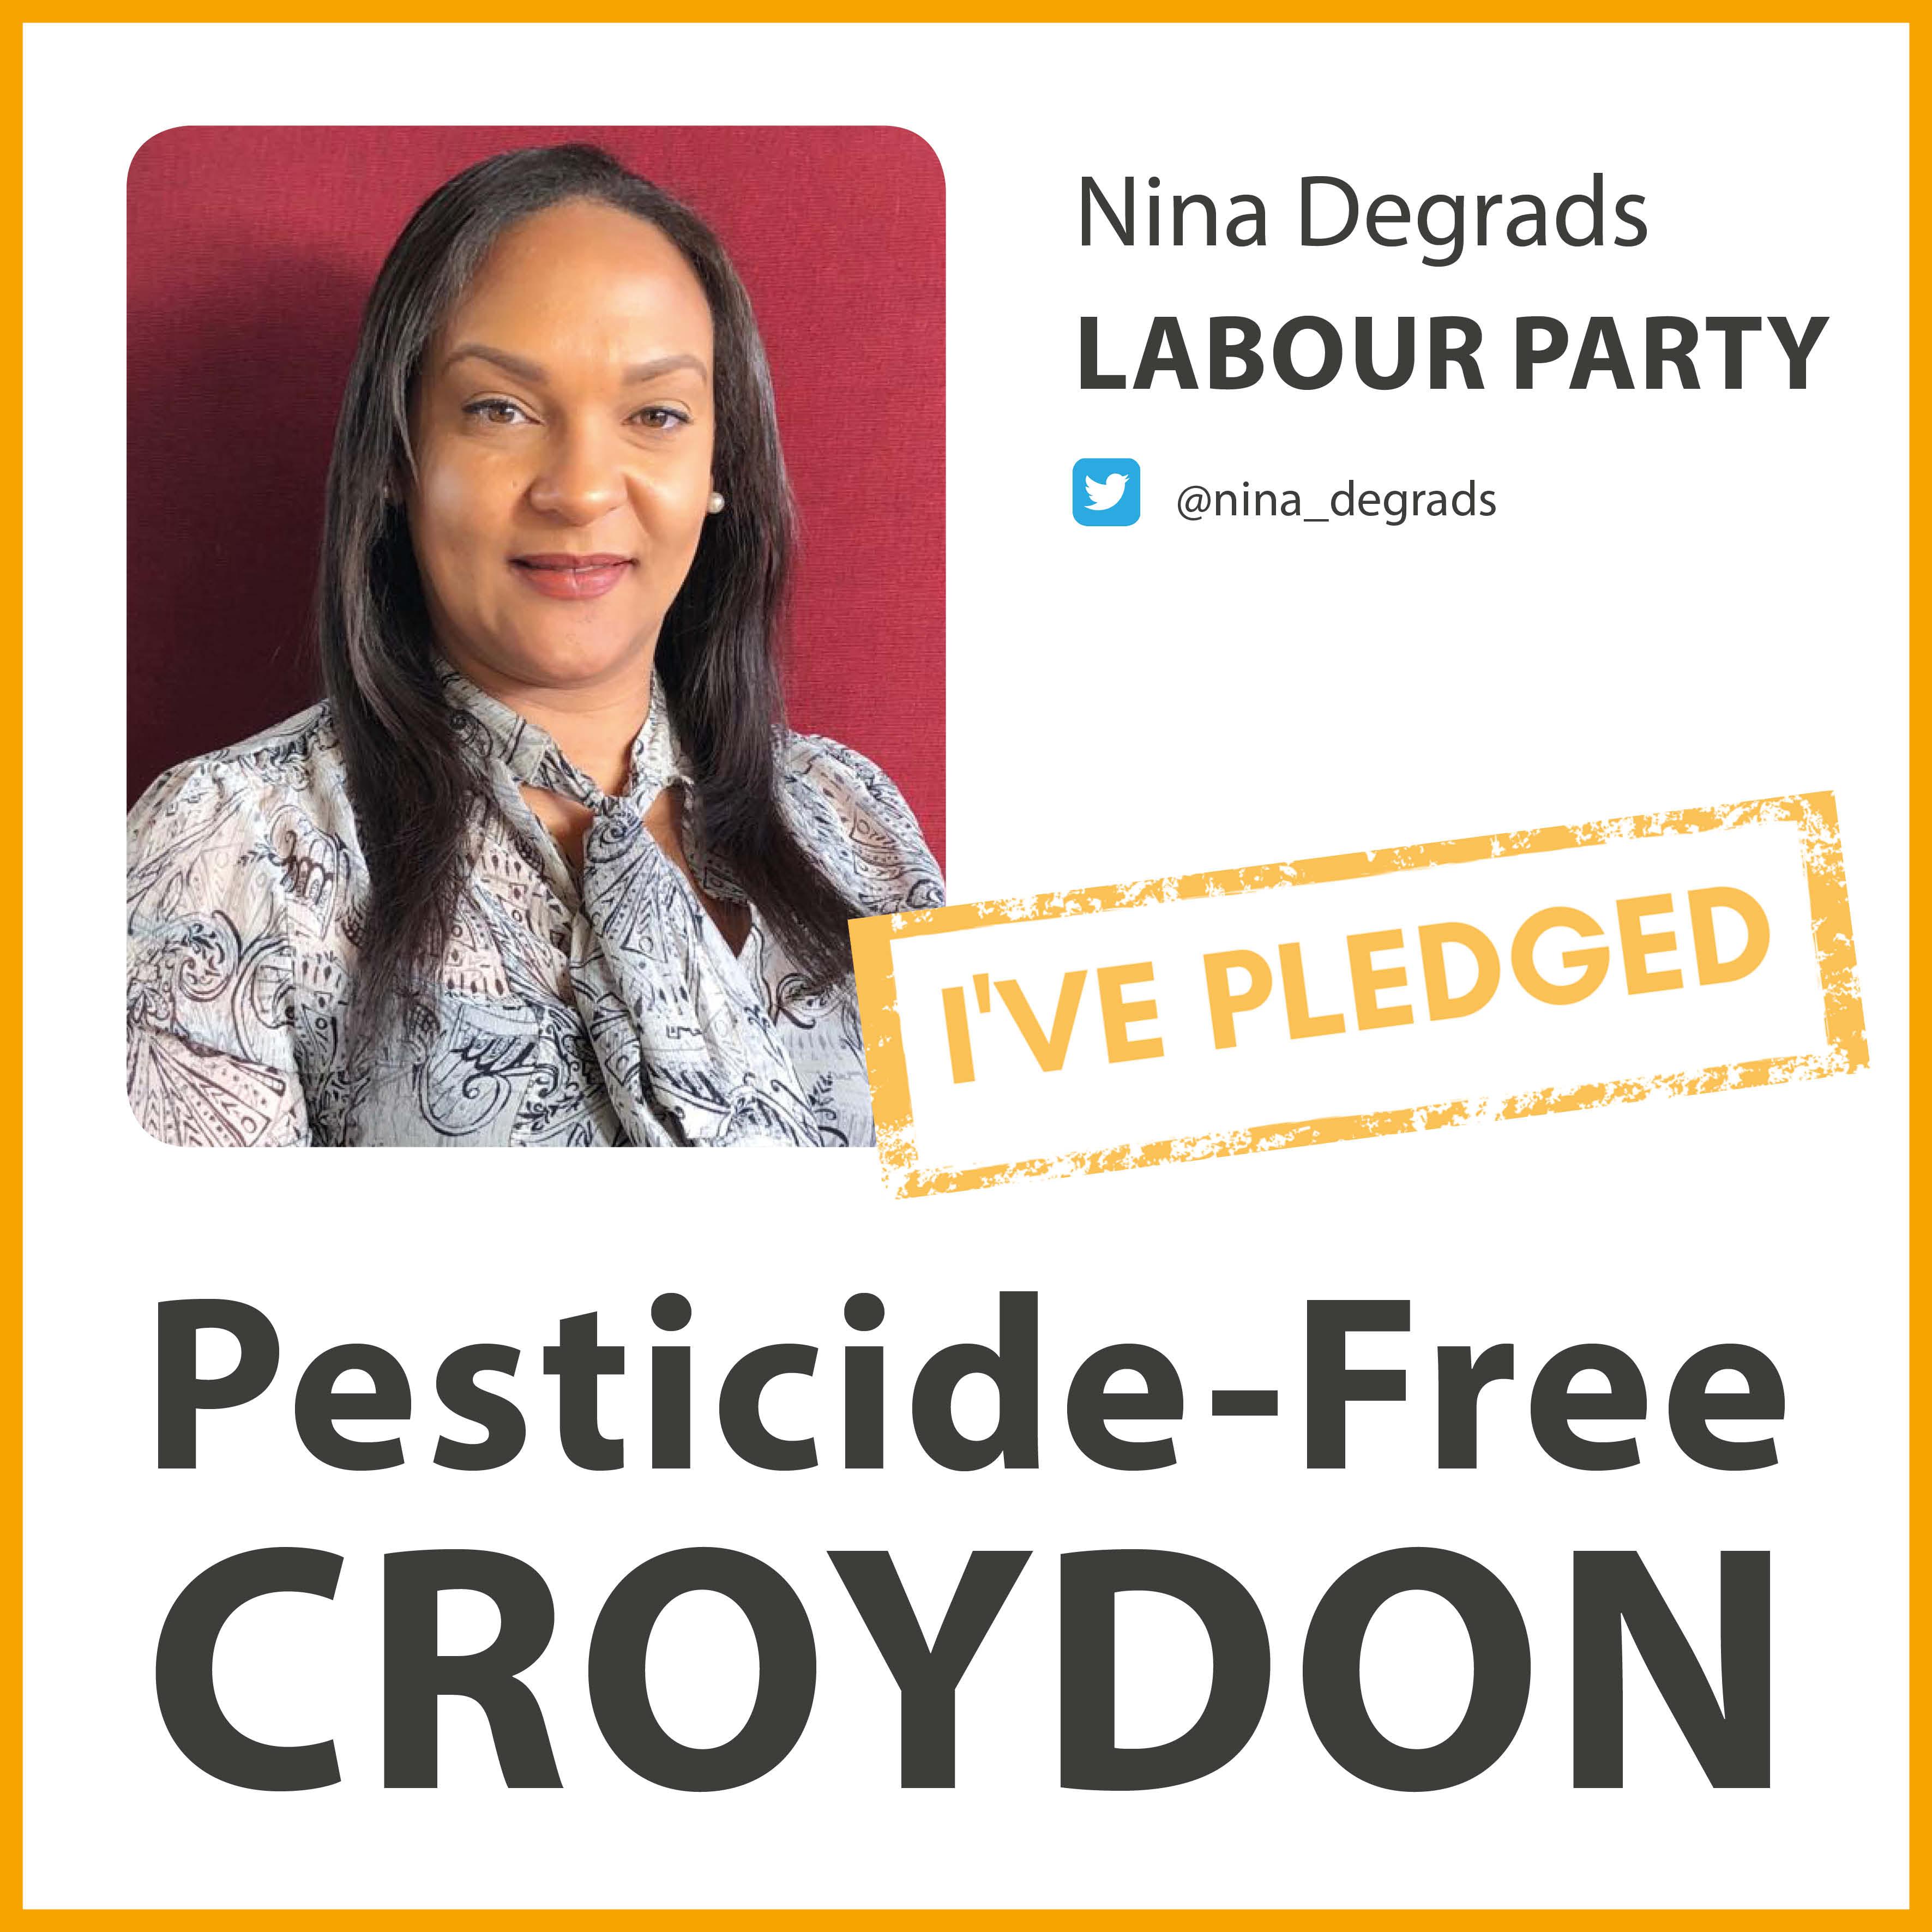 Nina Degrads has taken the pesticide-free pledge in Croydon